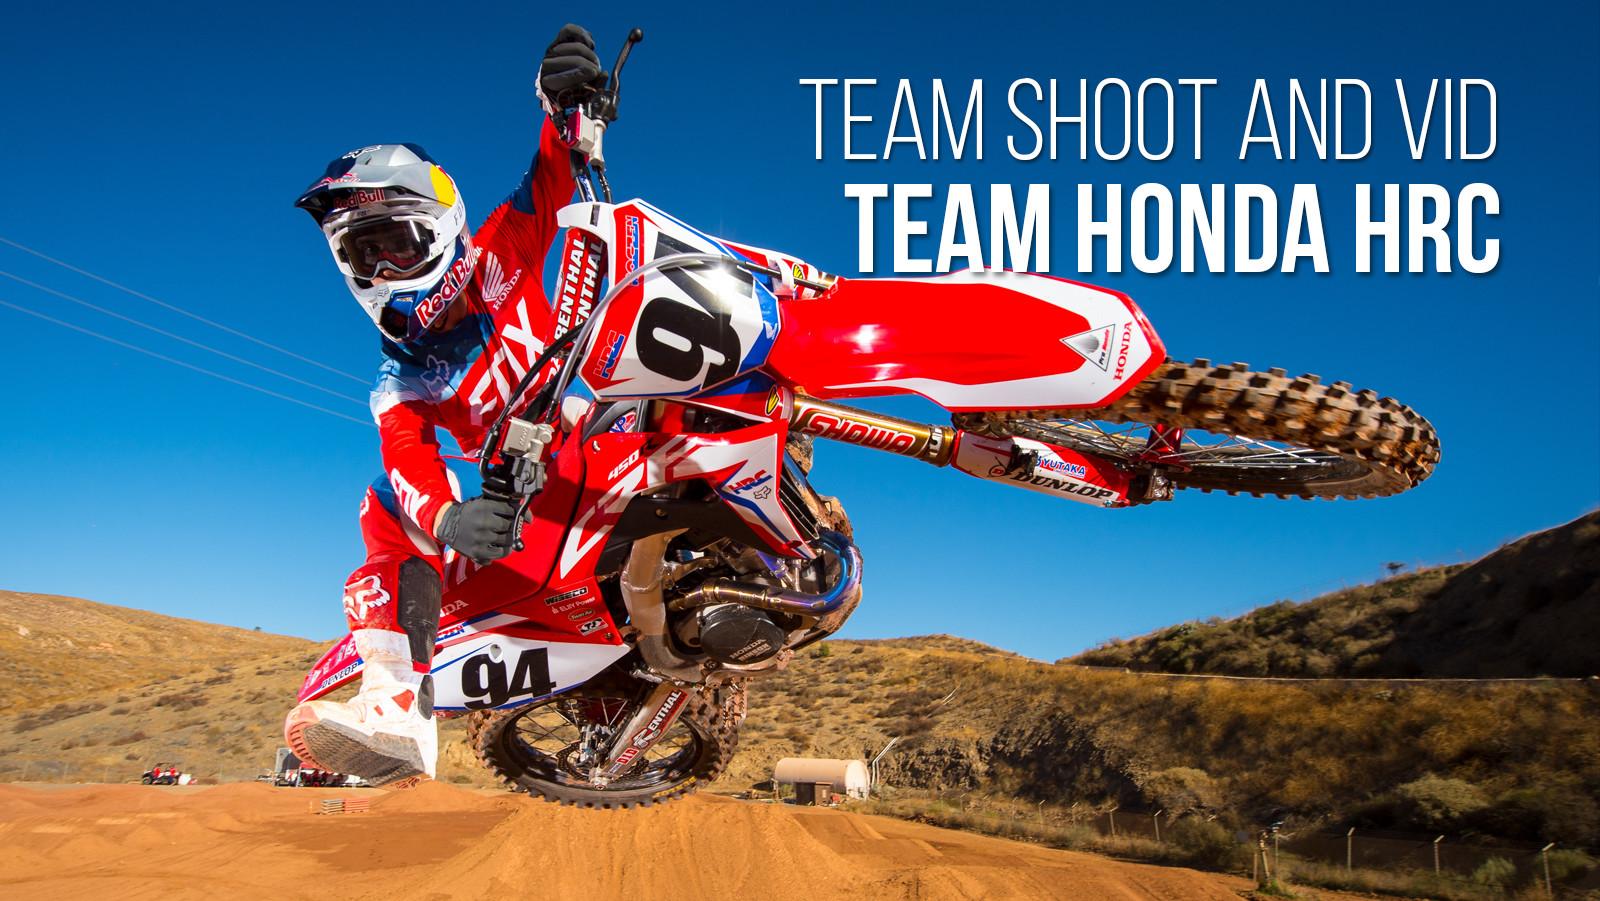 Team Shoot And Vid Team Honda Hrc Motocross Feature Stories